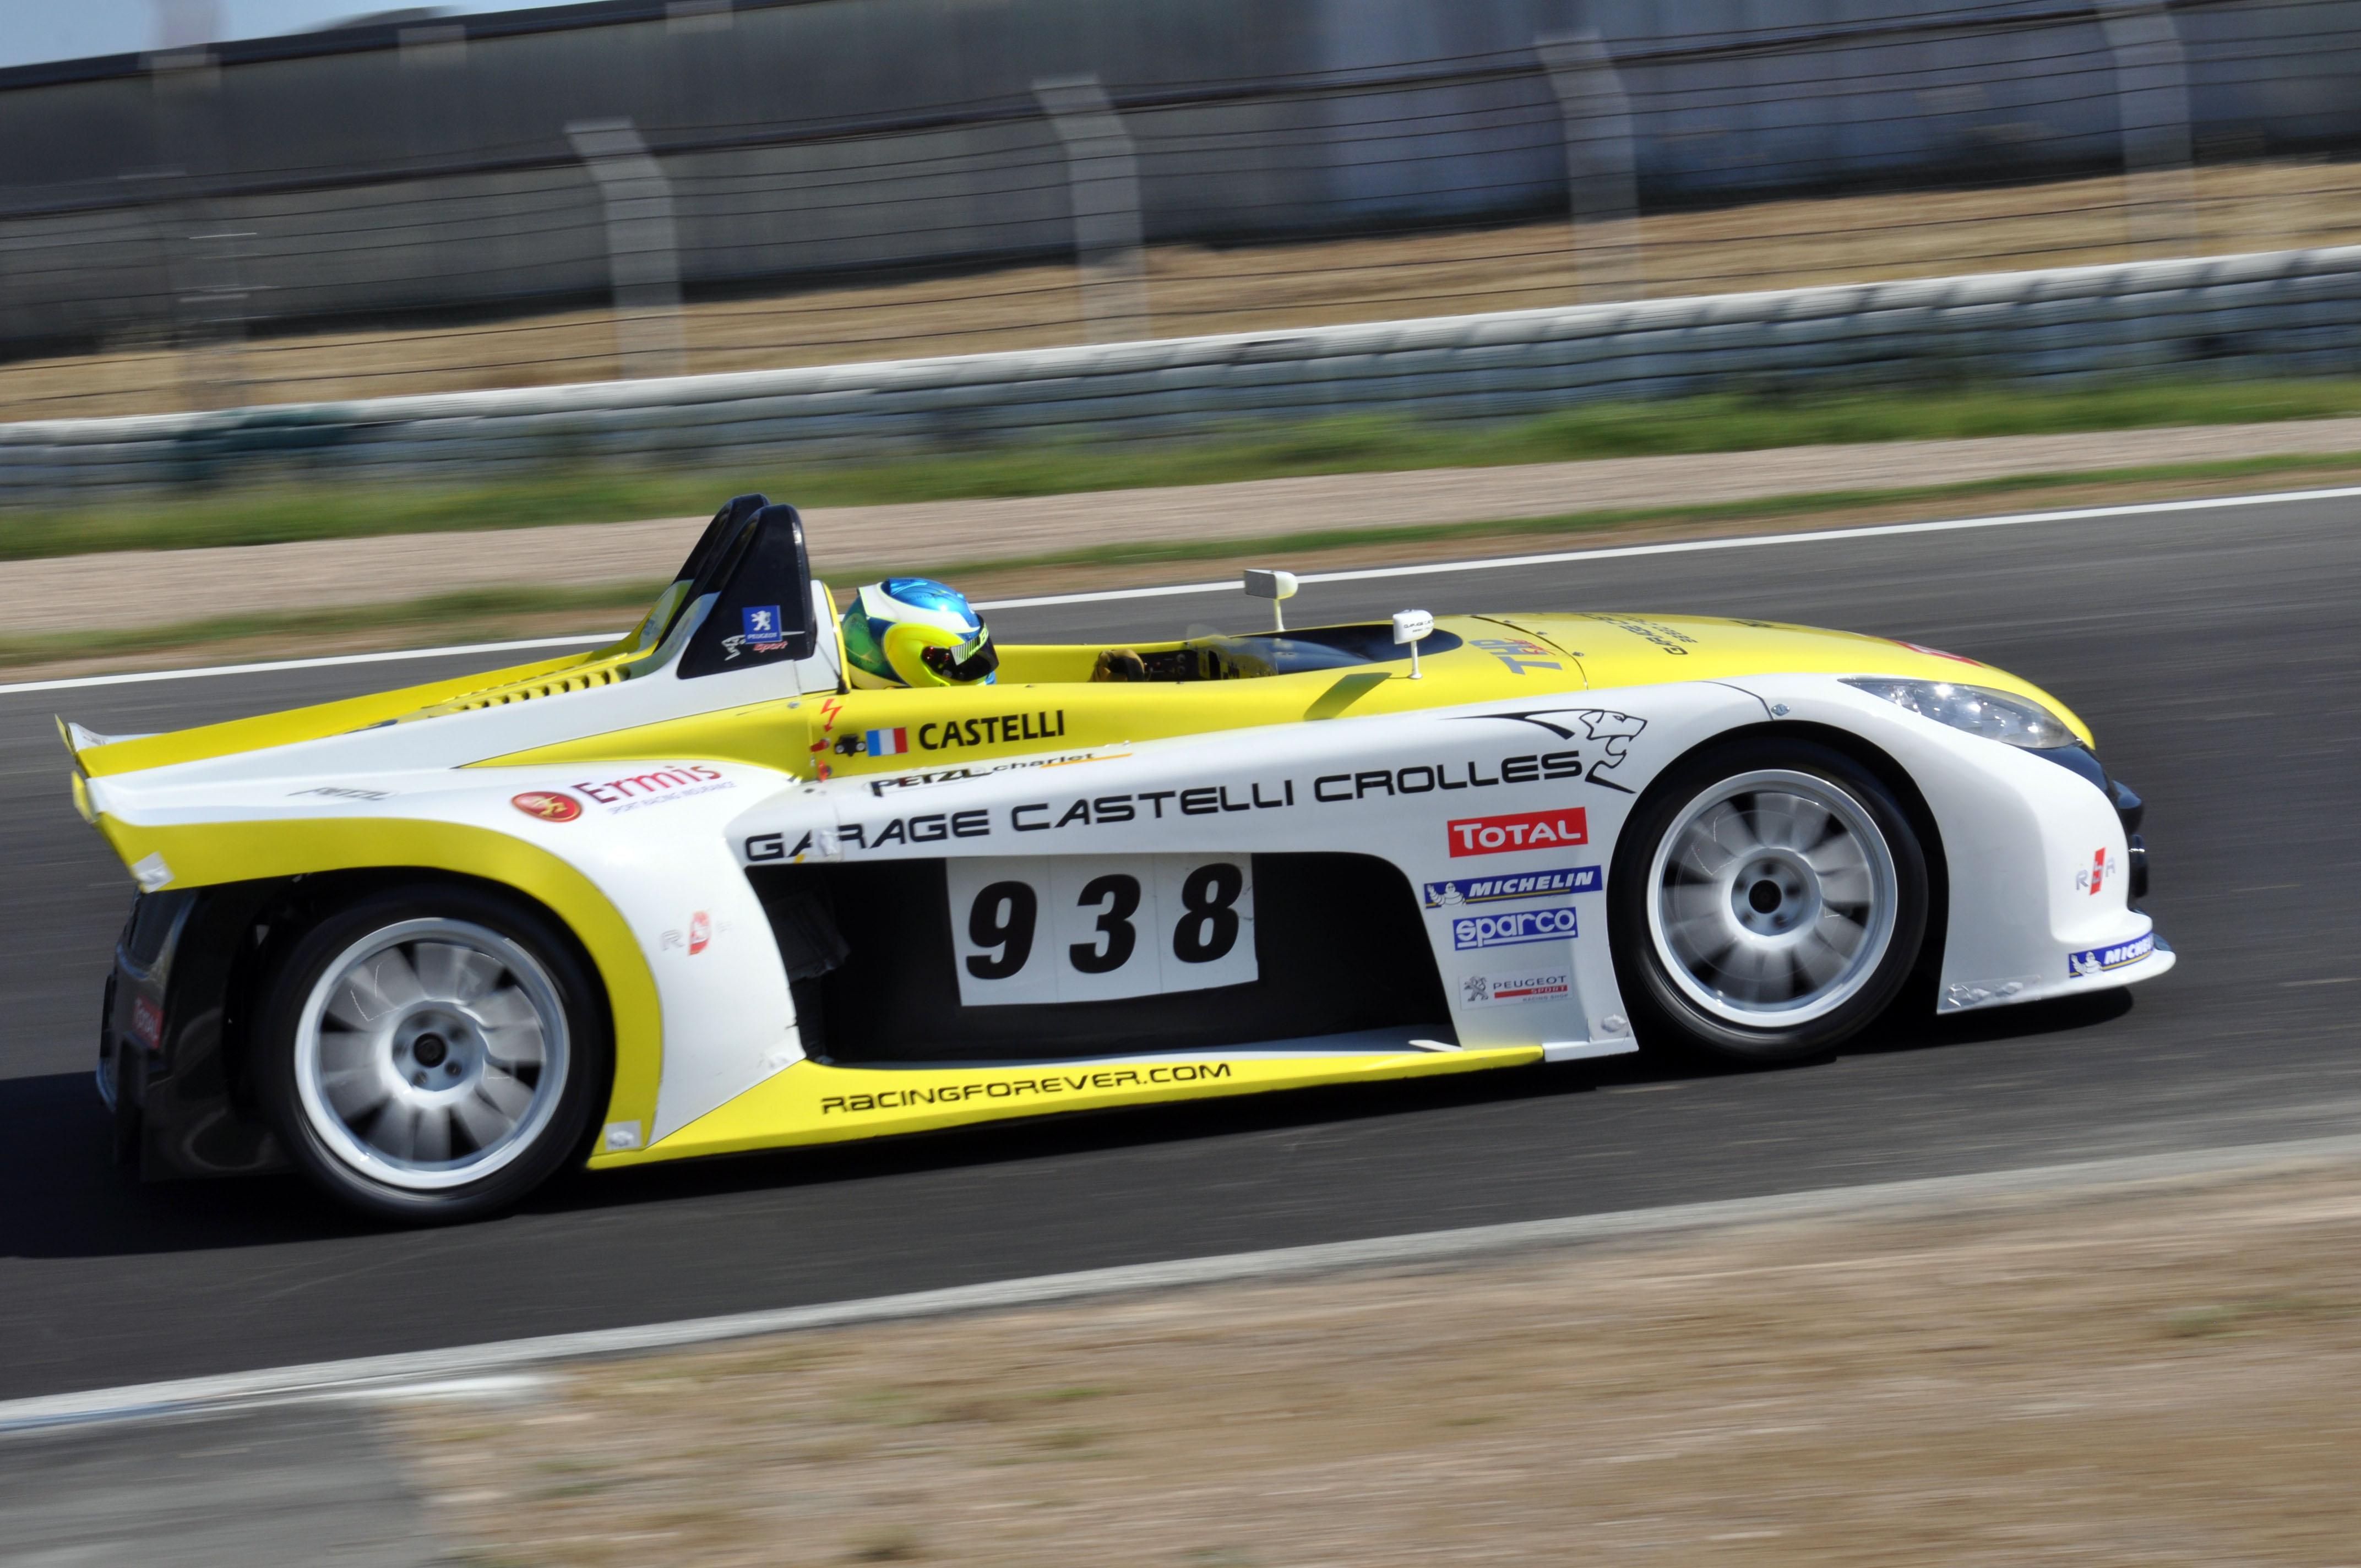 Palmarès Racing Forever 2004 - 2019